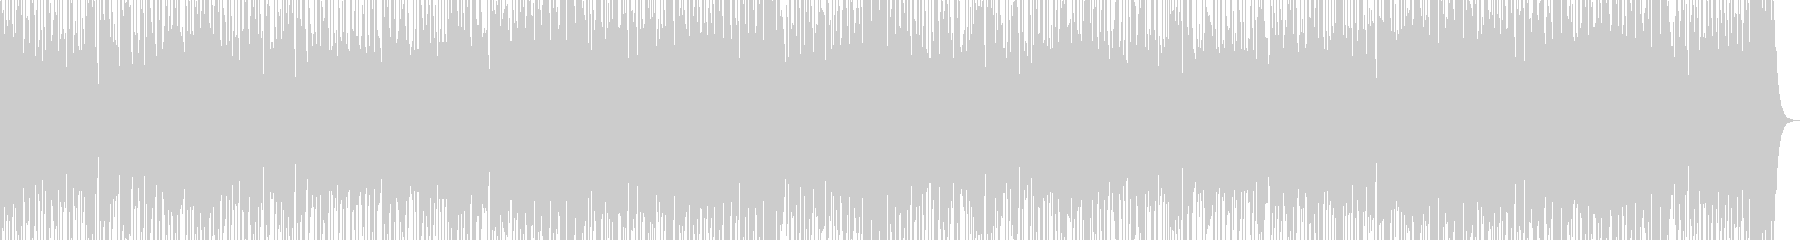 Funkなスラップベースとトランペットの未再生の波形